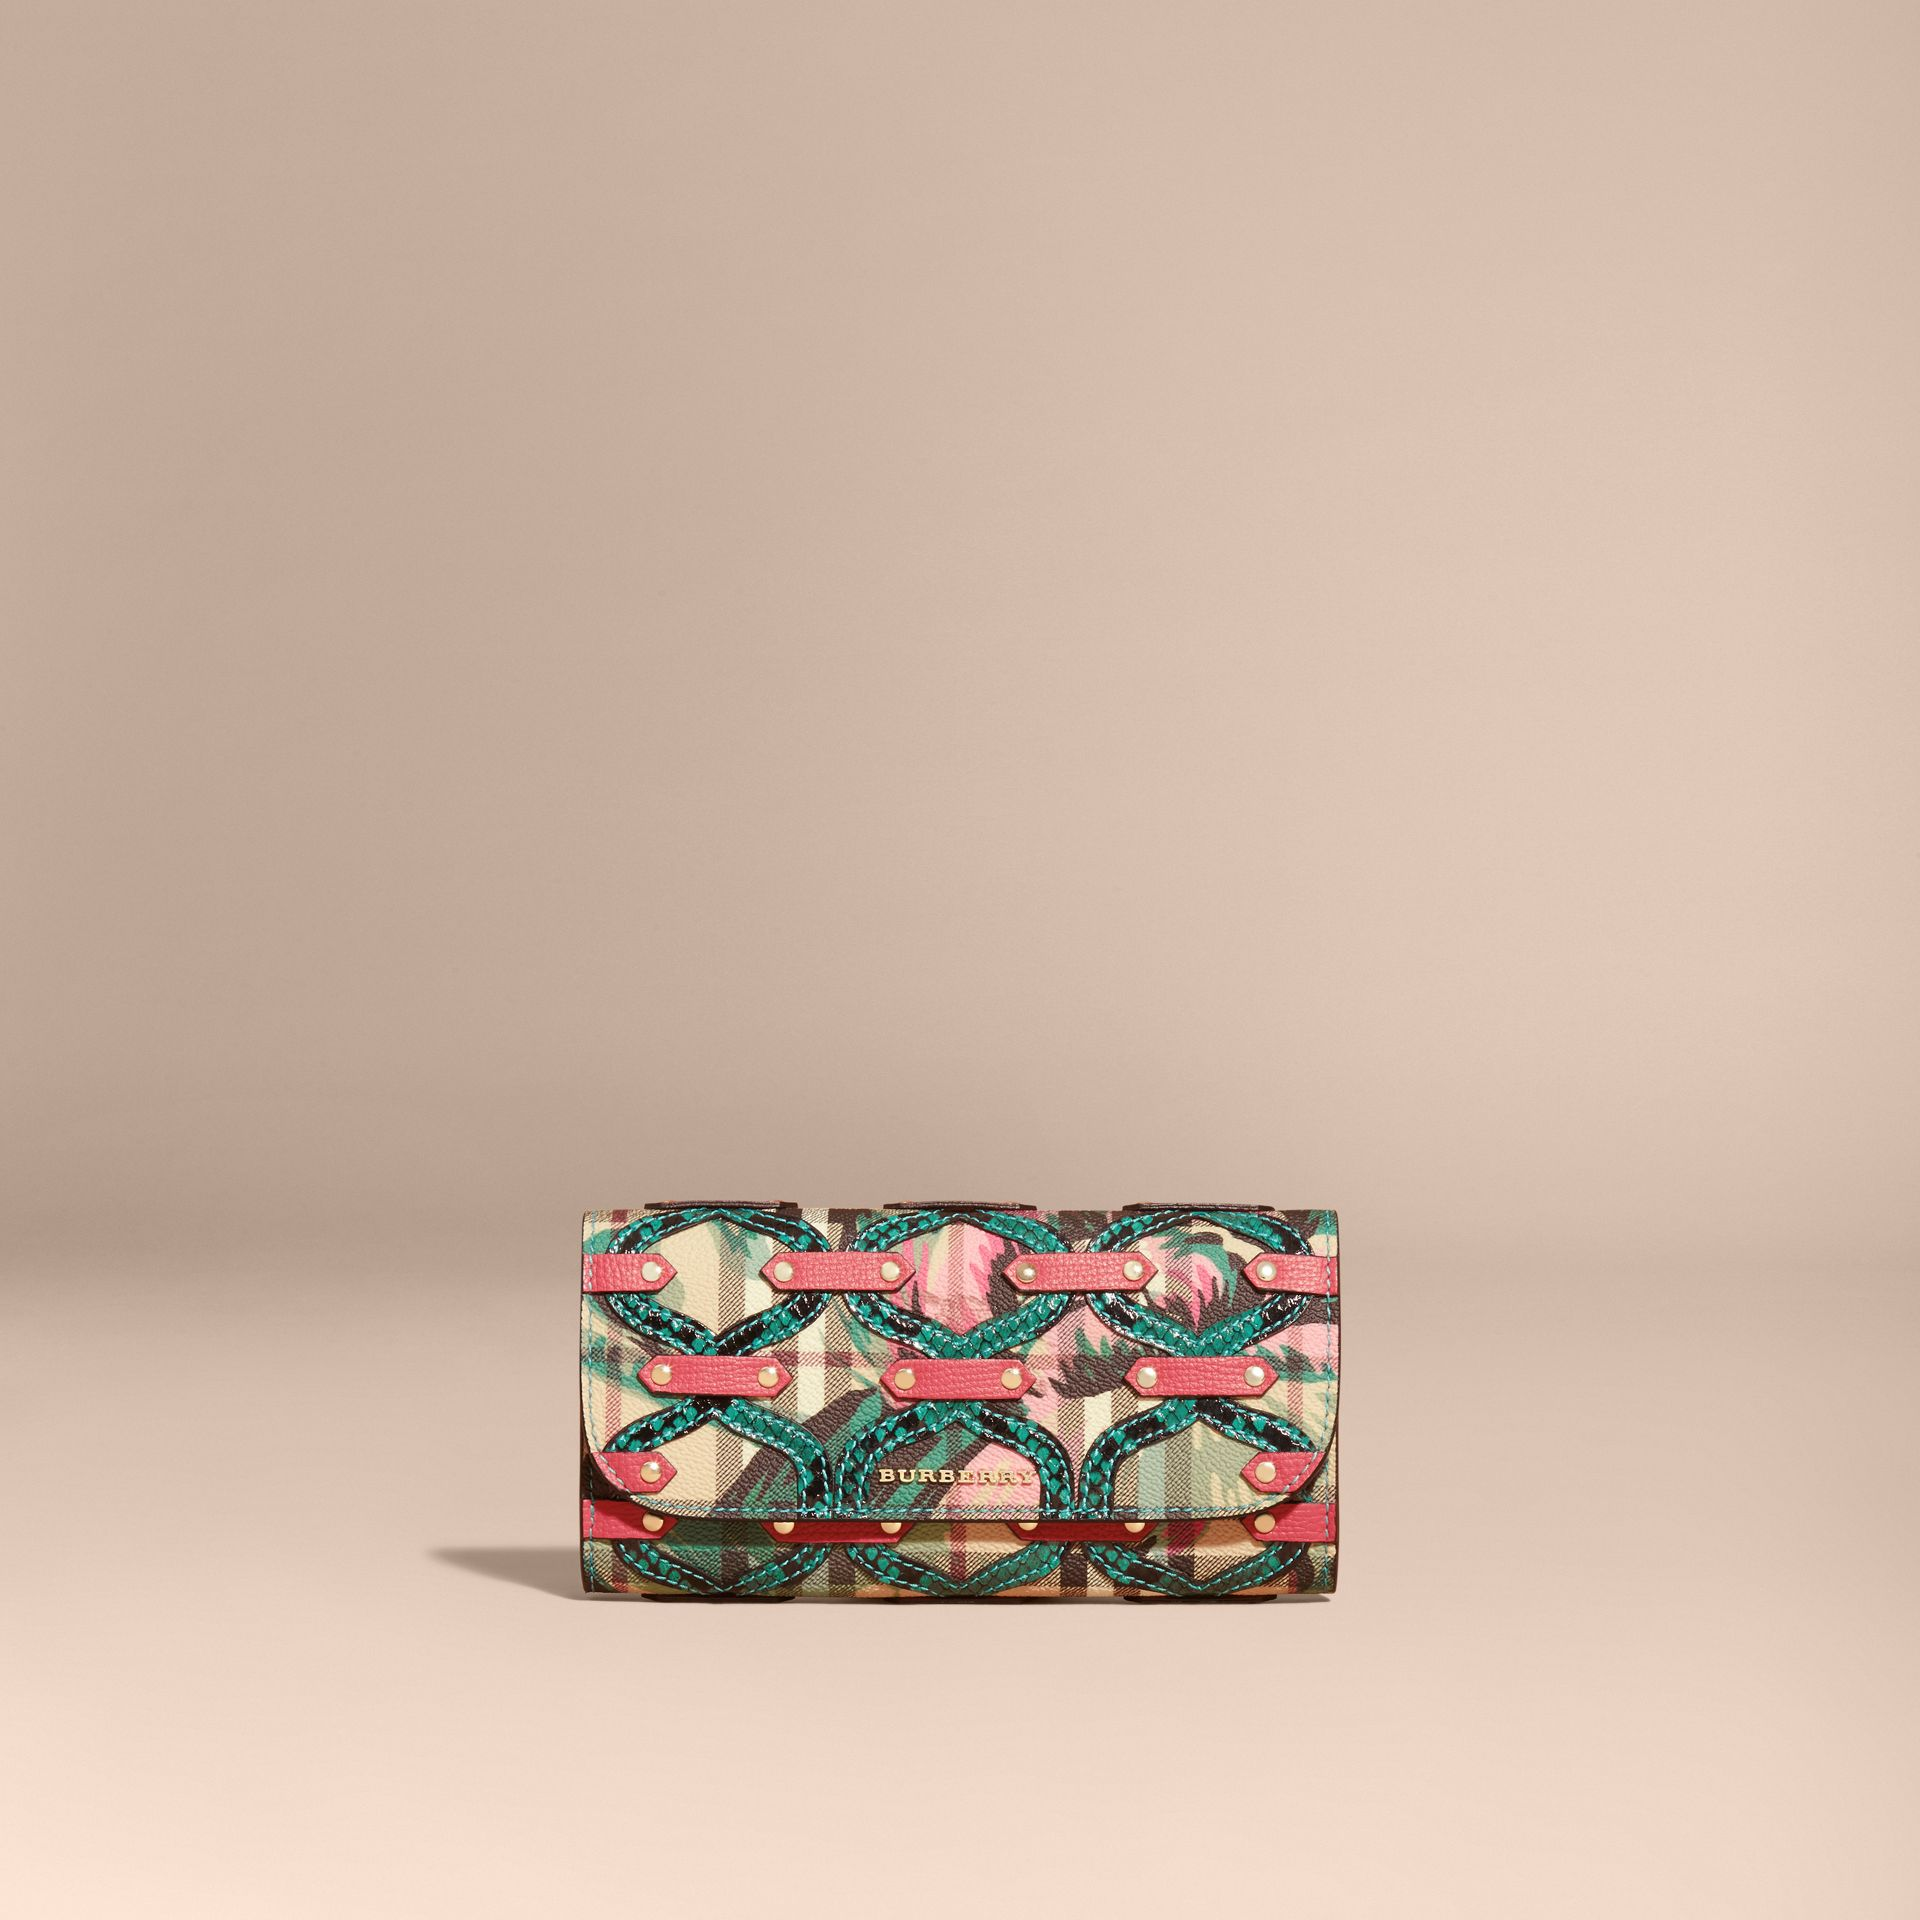 Snakeskin Appliqué Peony Rose Print Haymarket Check Continental Wallet in Plum Pink - gallery image 6